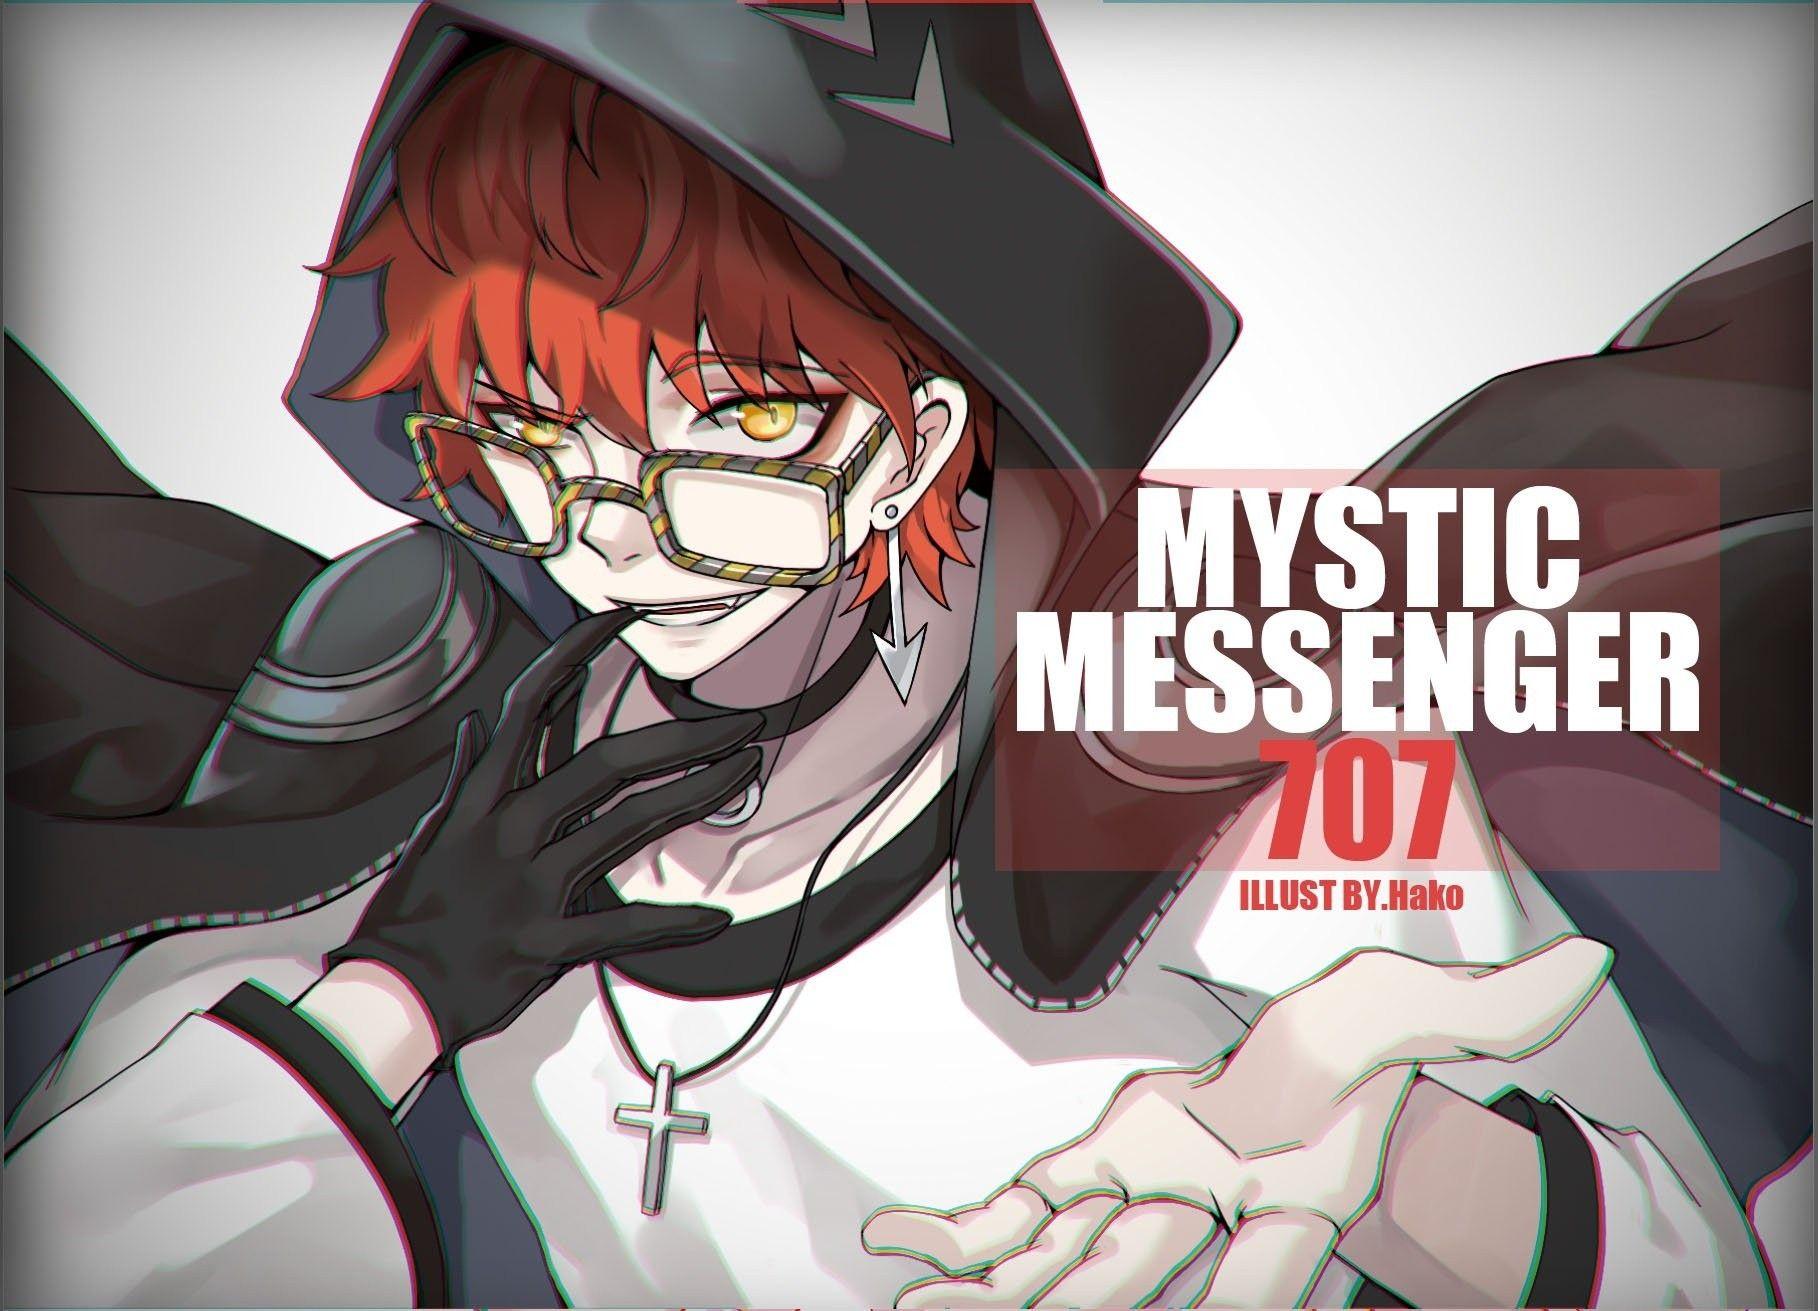 Mystic Messenger || 707